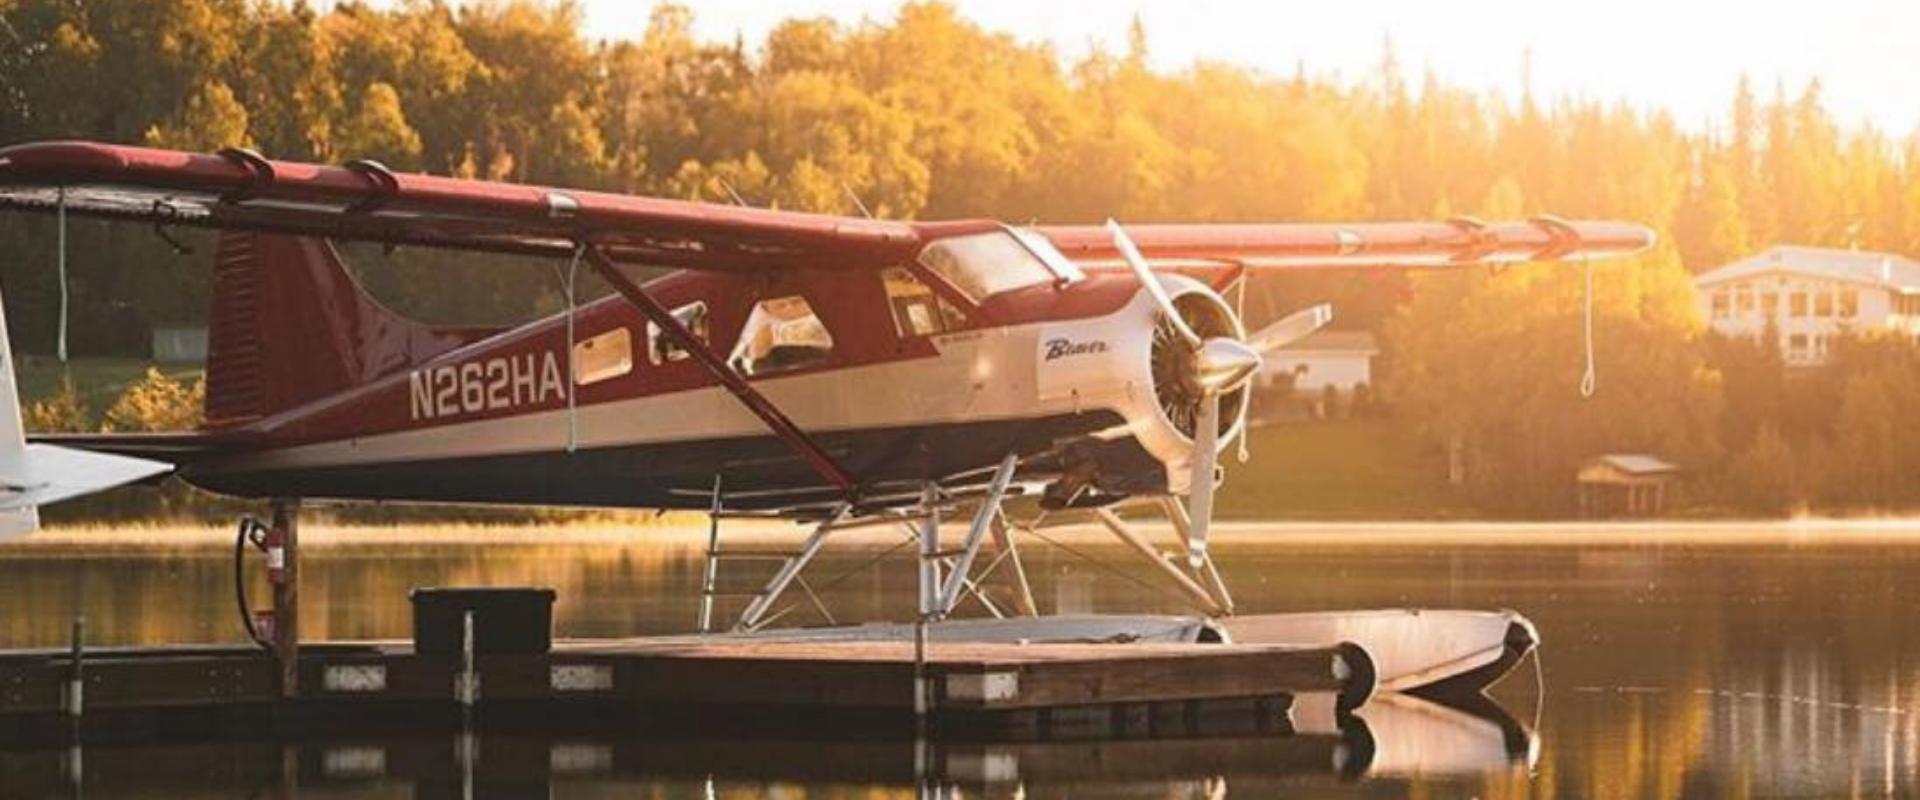 High Adventure Air Charters